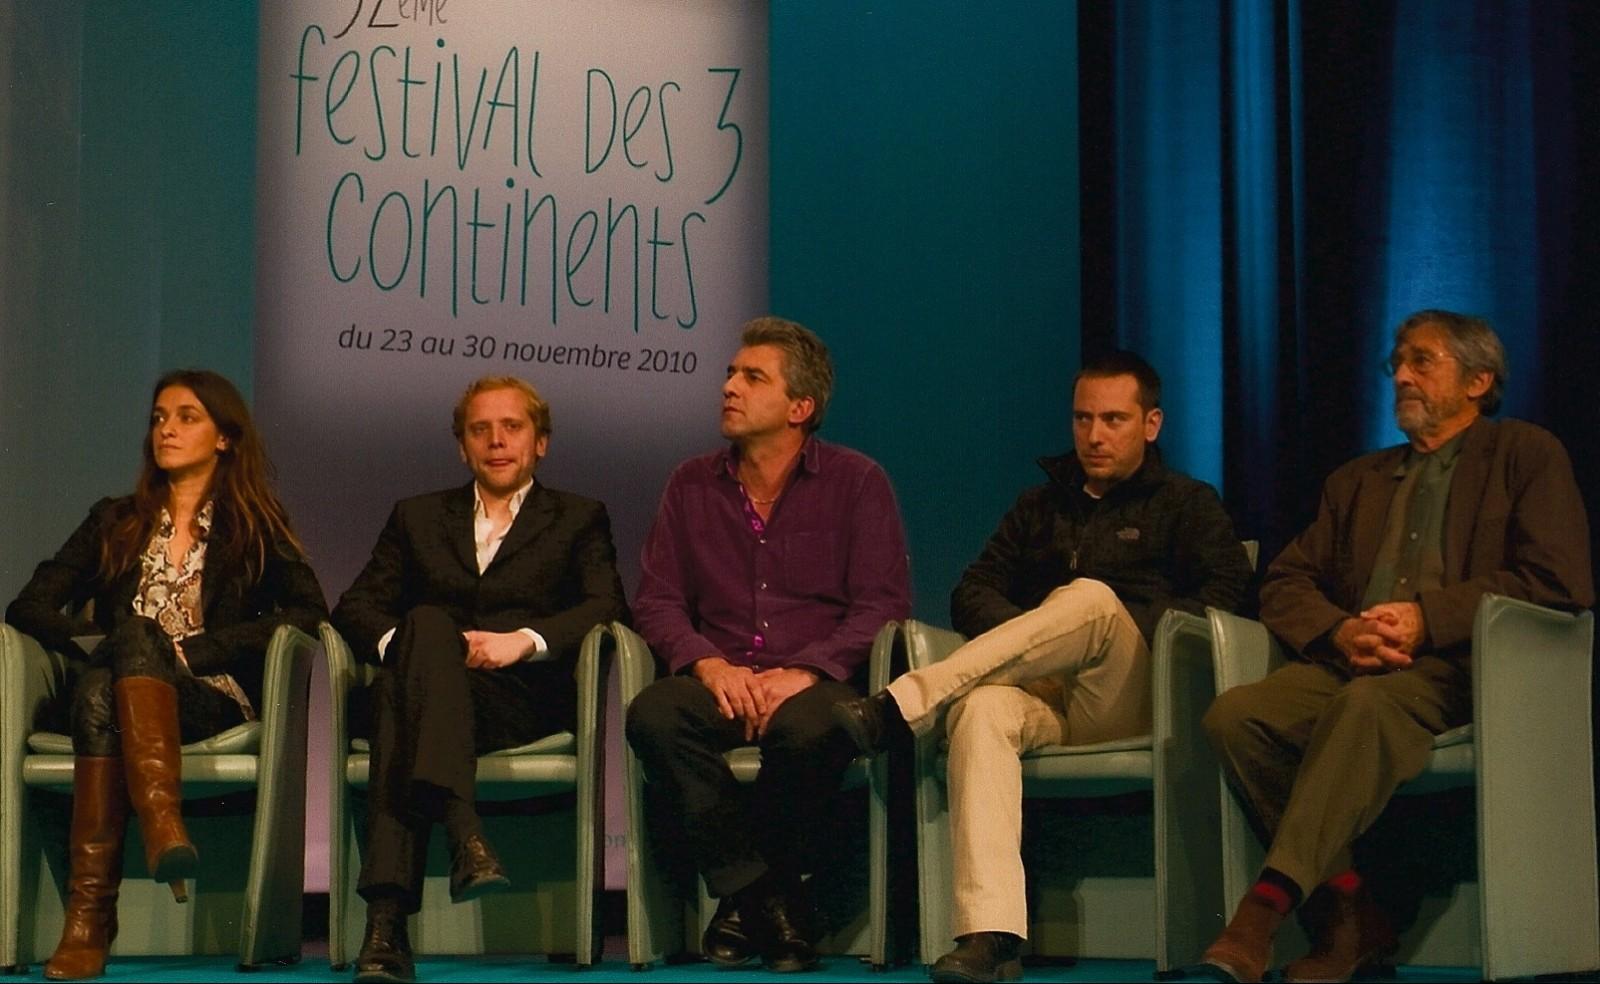 Jury : Joana Preiss, Sébastien Chesneau, Alain Guiraudie, Erez Pery, Jacques Loiseleux